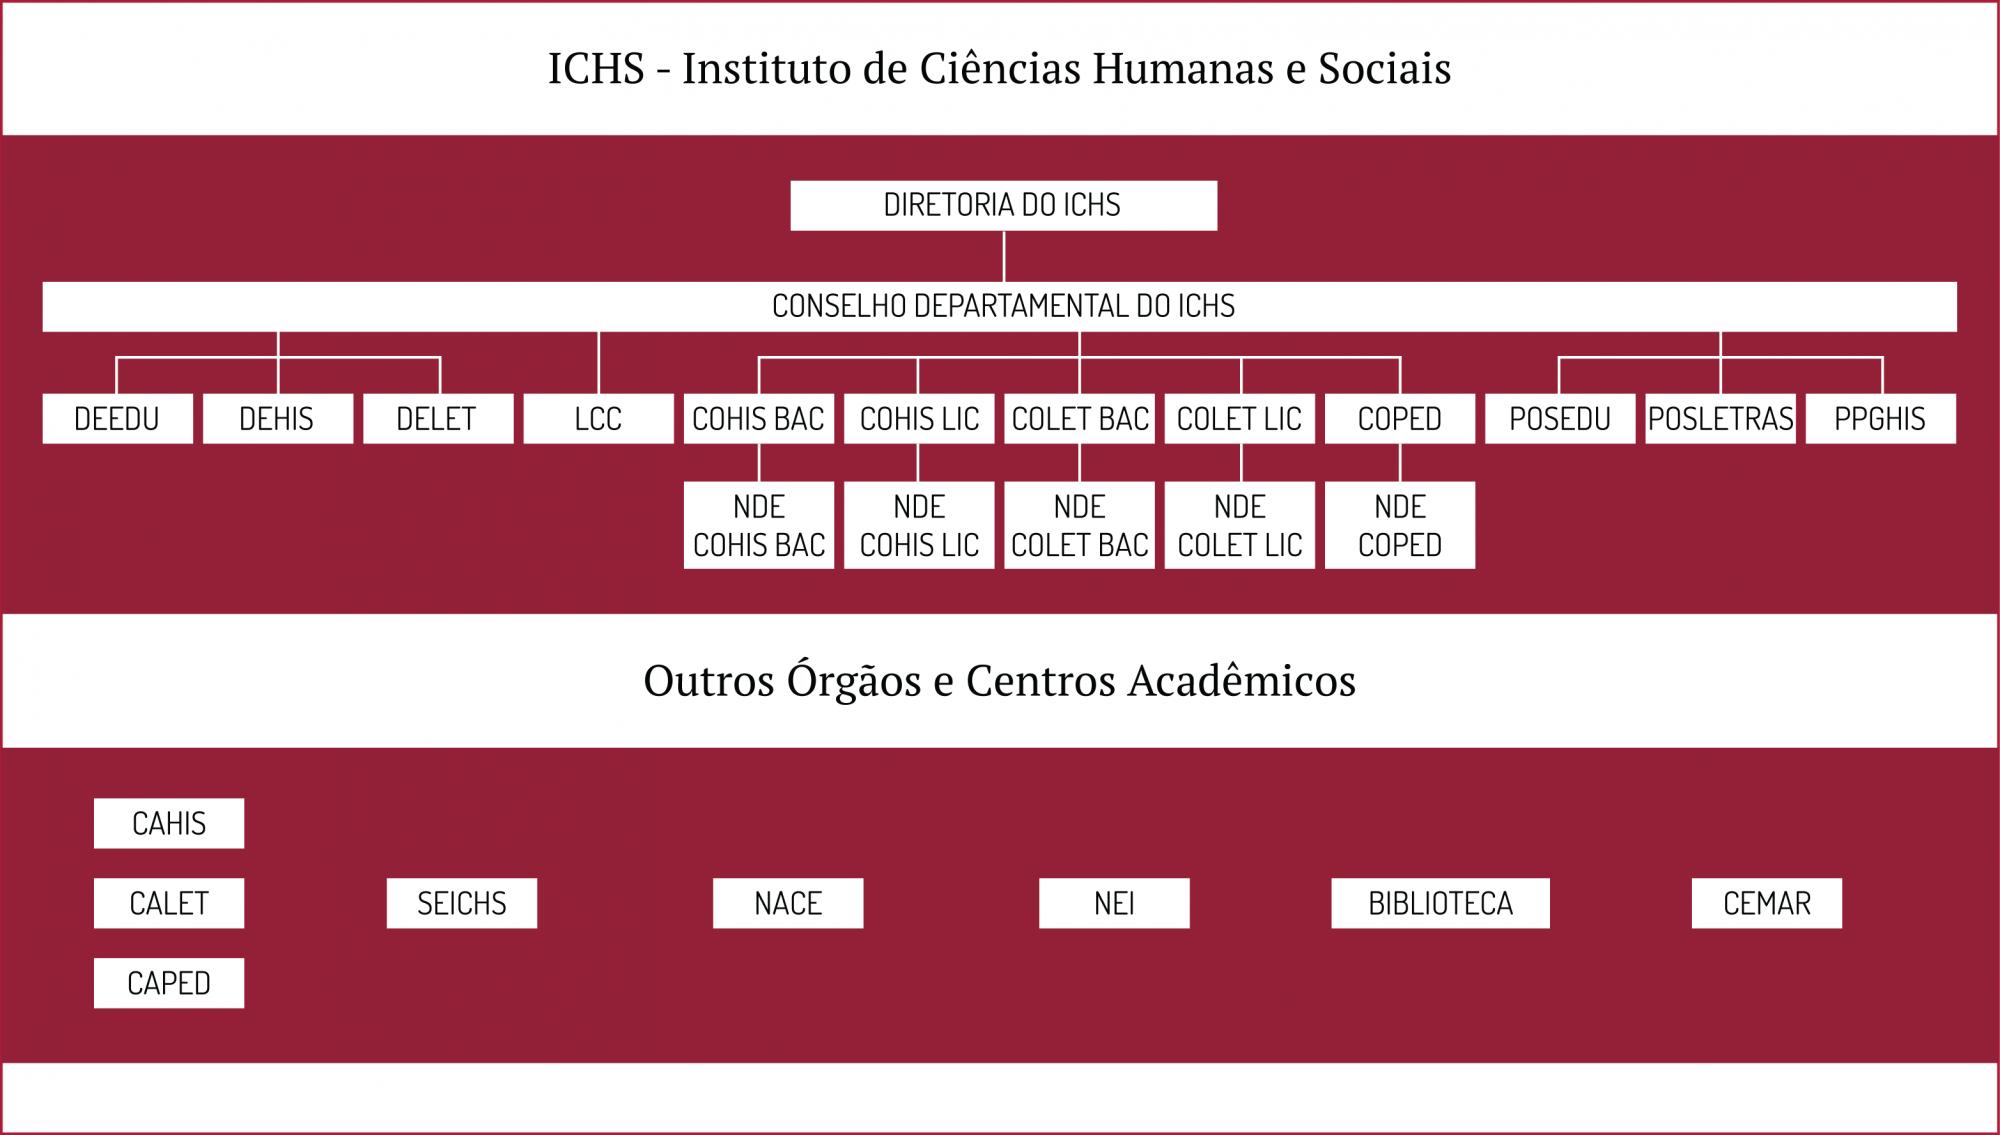 Estrutura Administrativa ICHS